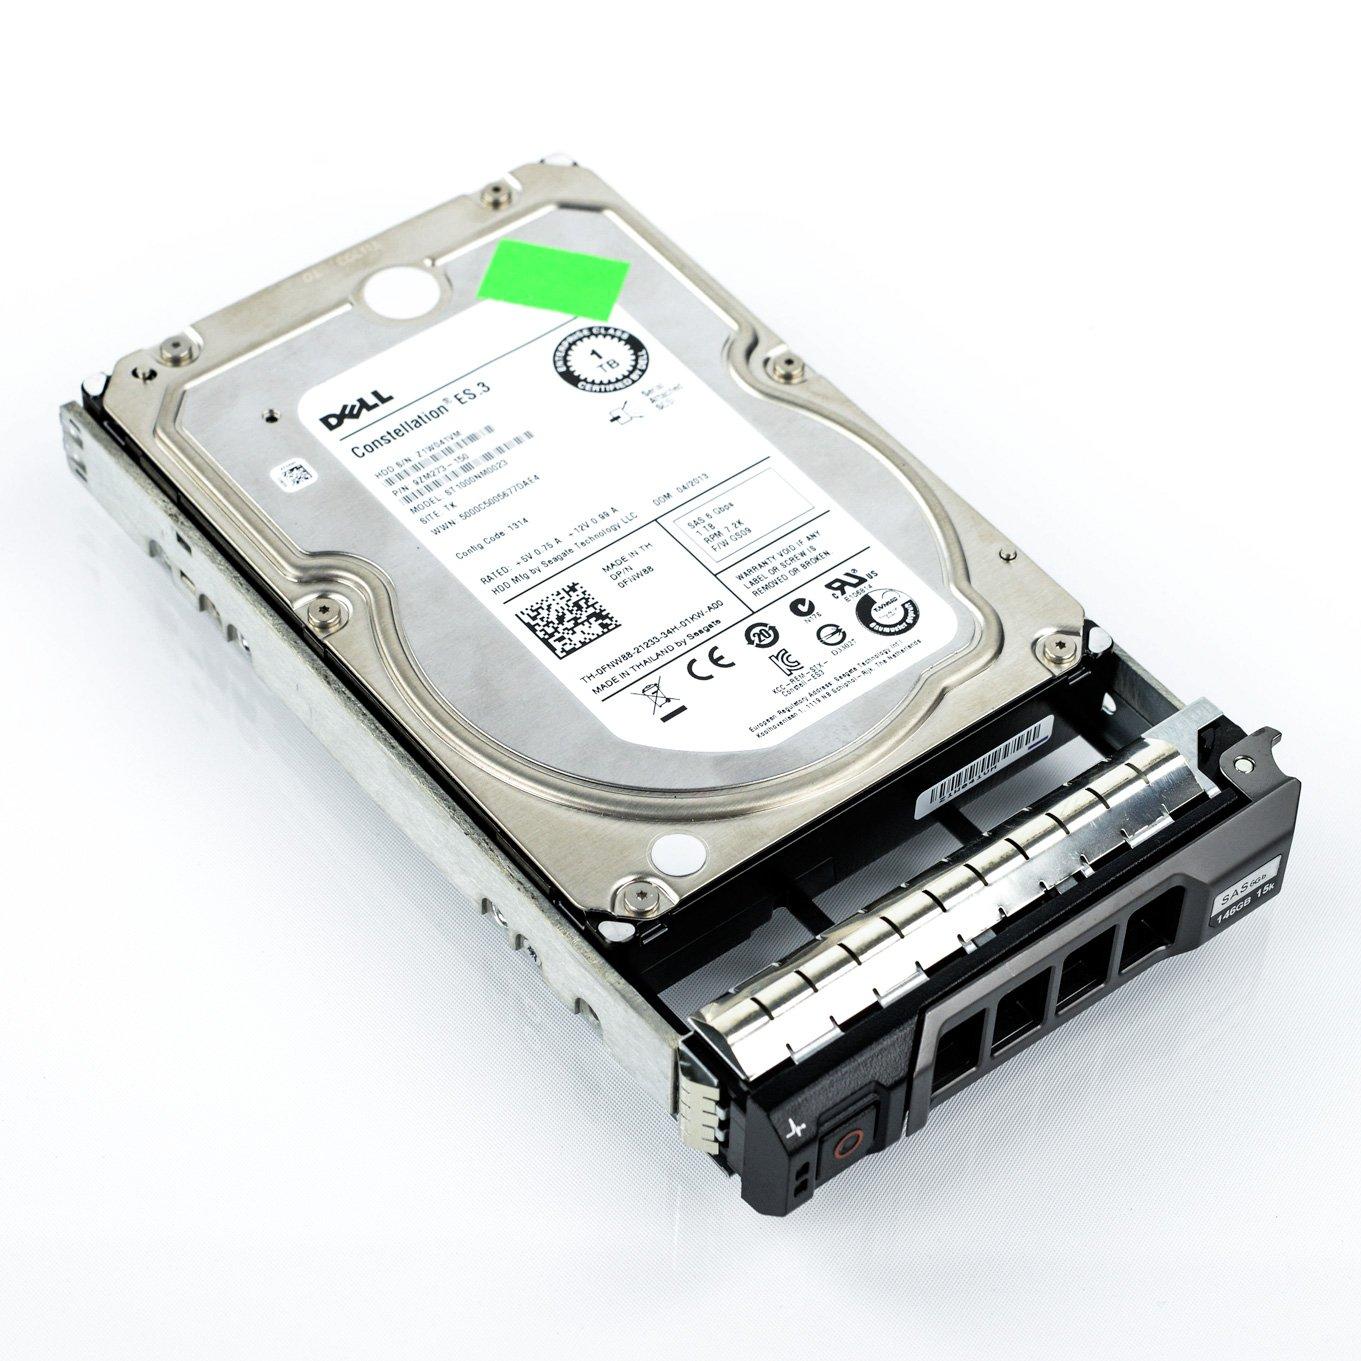 1TB 7.2K RPM Near Line 6Gbps SAS 3.5`` Hot Plug Hard Drive Kit for sale